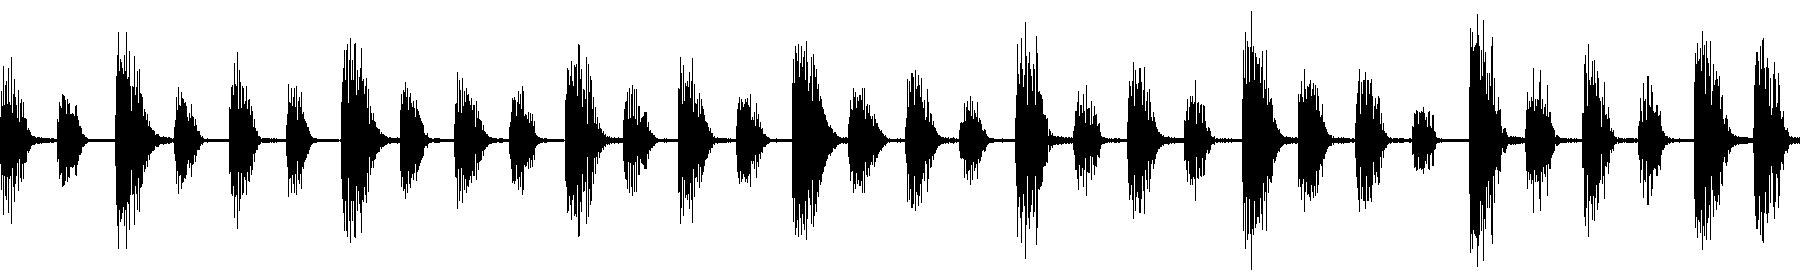 110 c chords 01